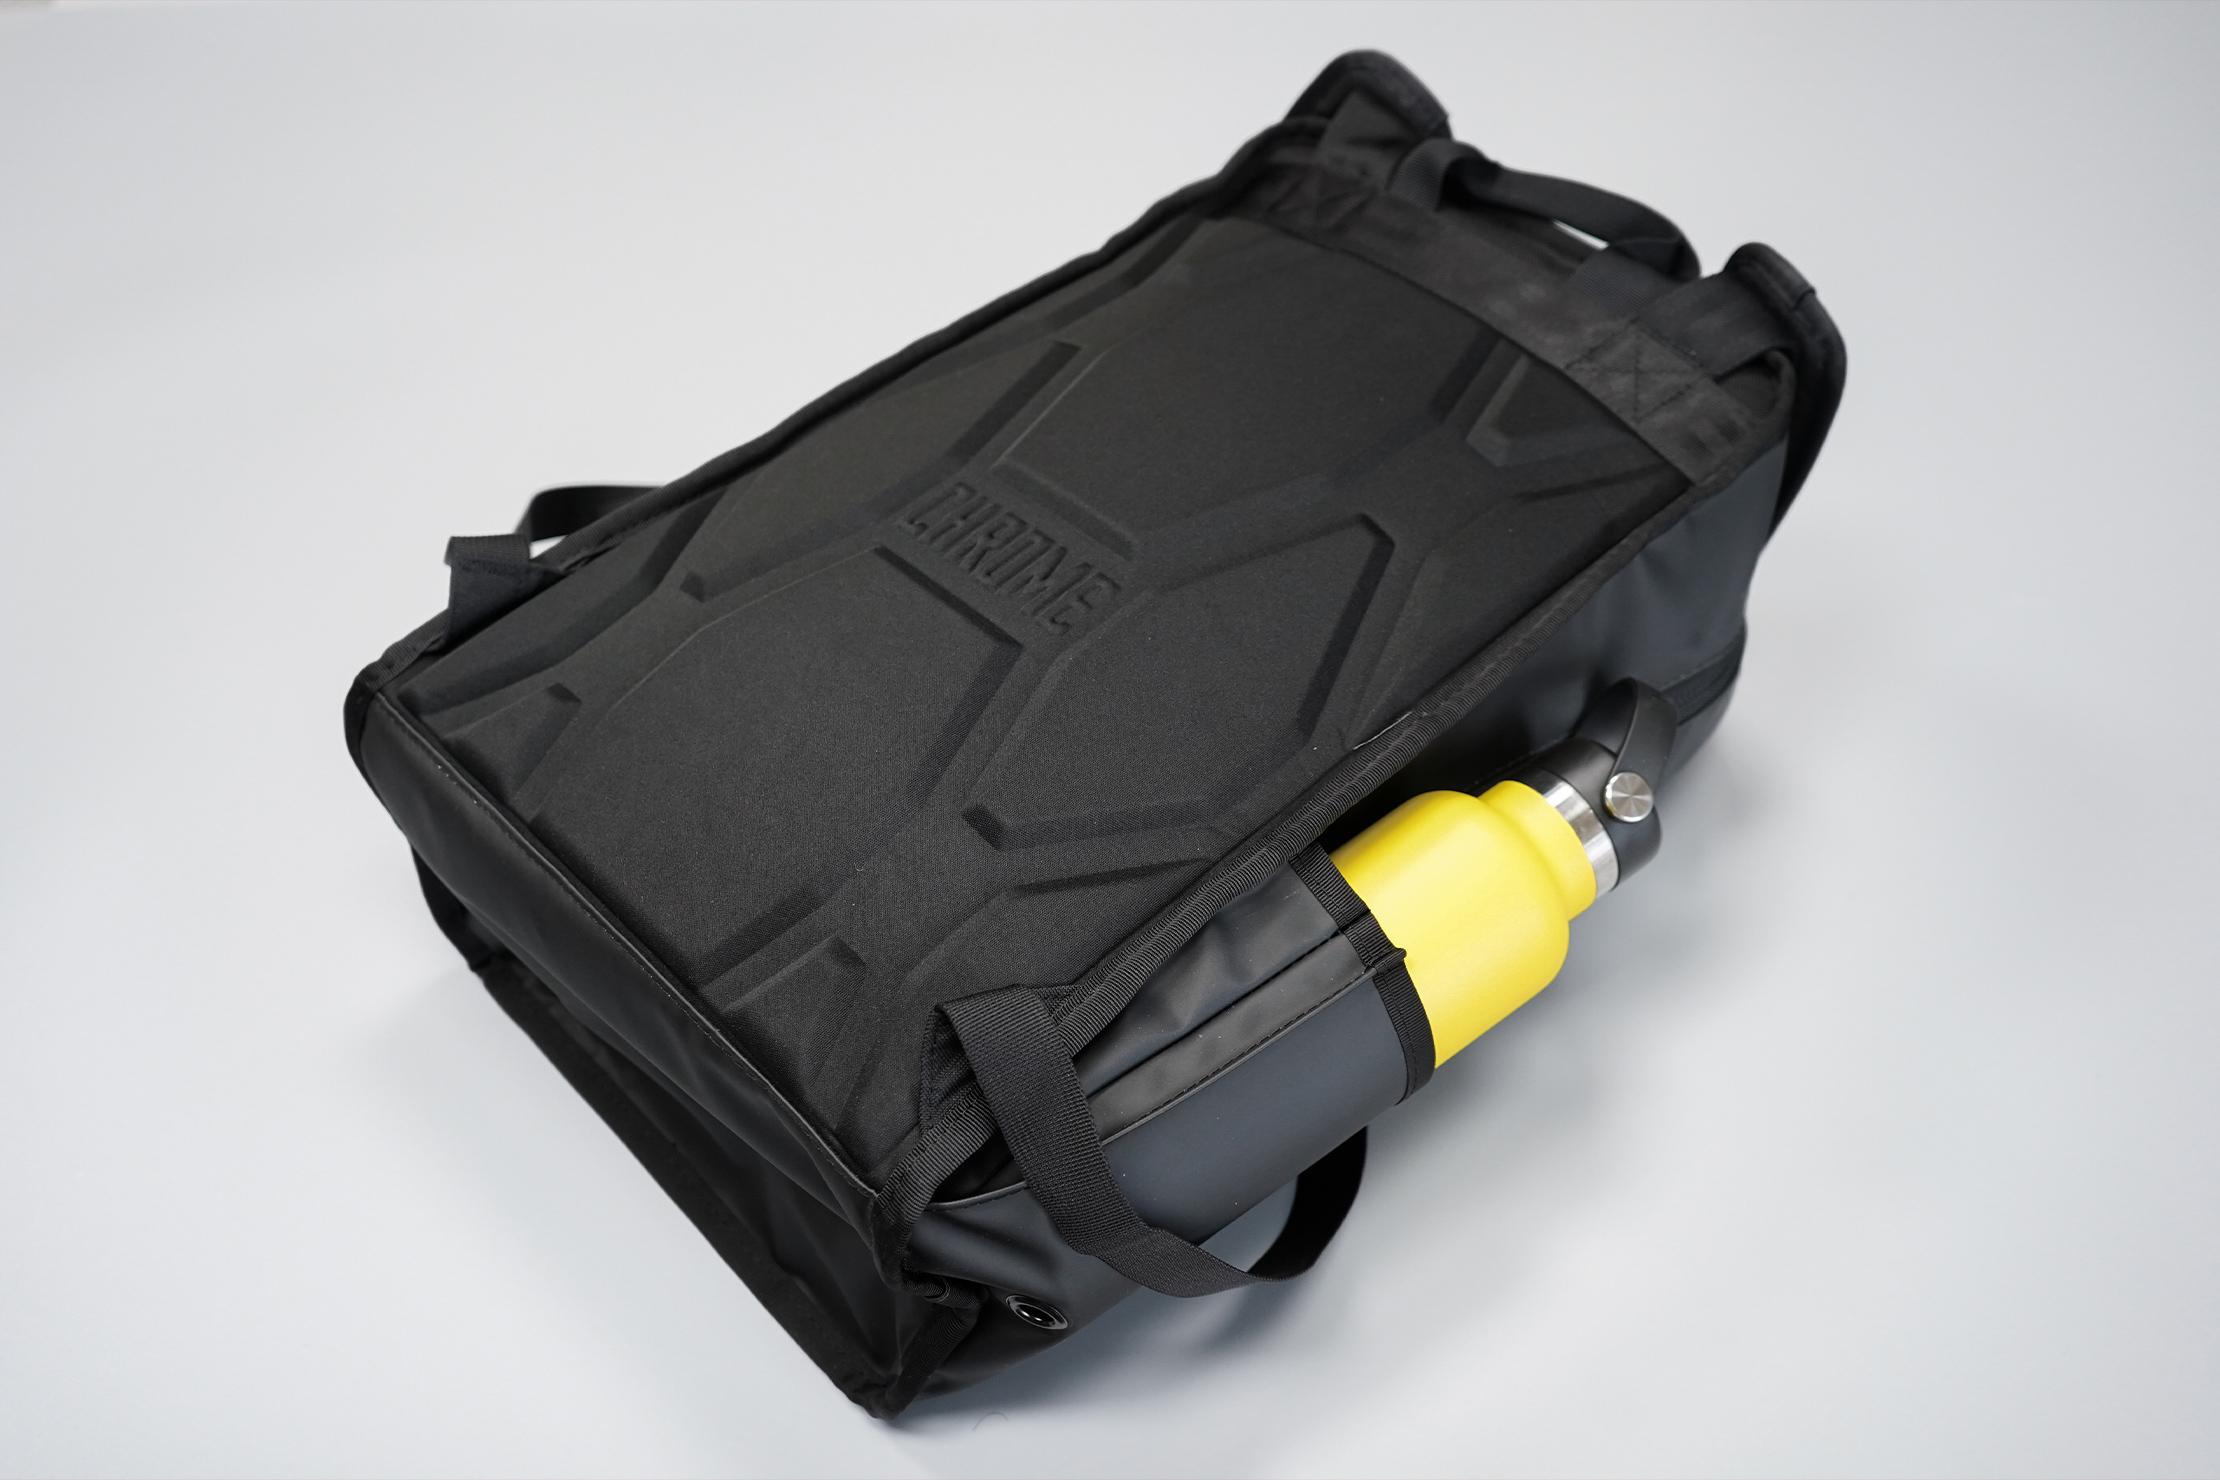 Chrome Industries Hondo Backpack Back Panel